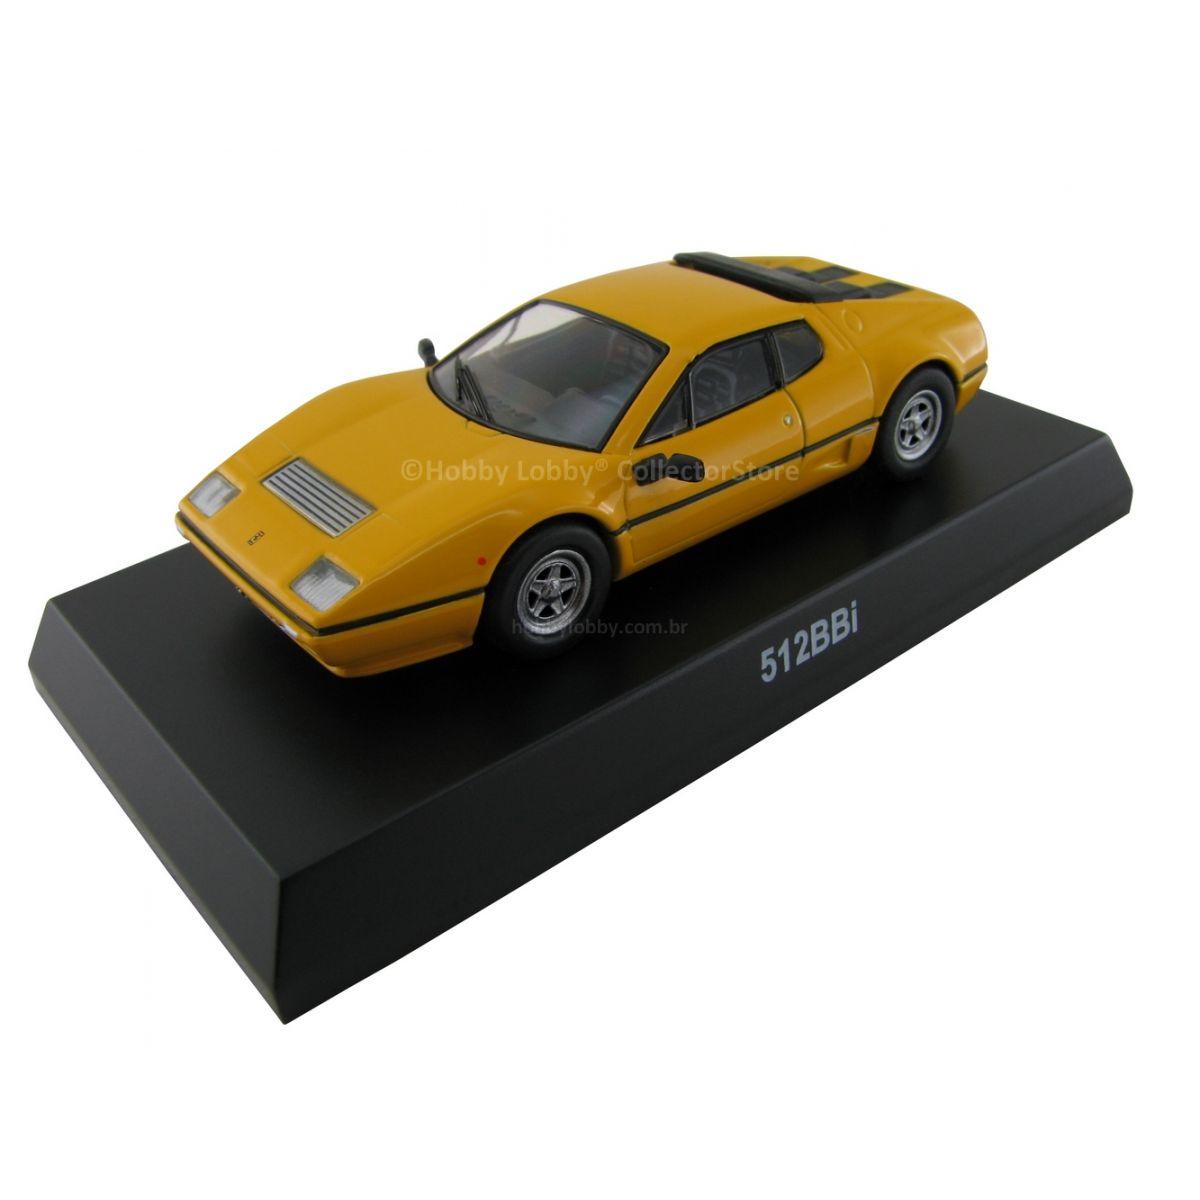 Kyosho - Ferrari Minicar Collection VI - Ferrari 512 BBi [amarela]  - Hobby Lobby CollectorStore